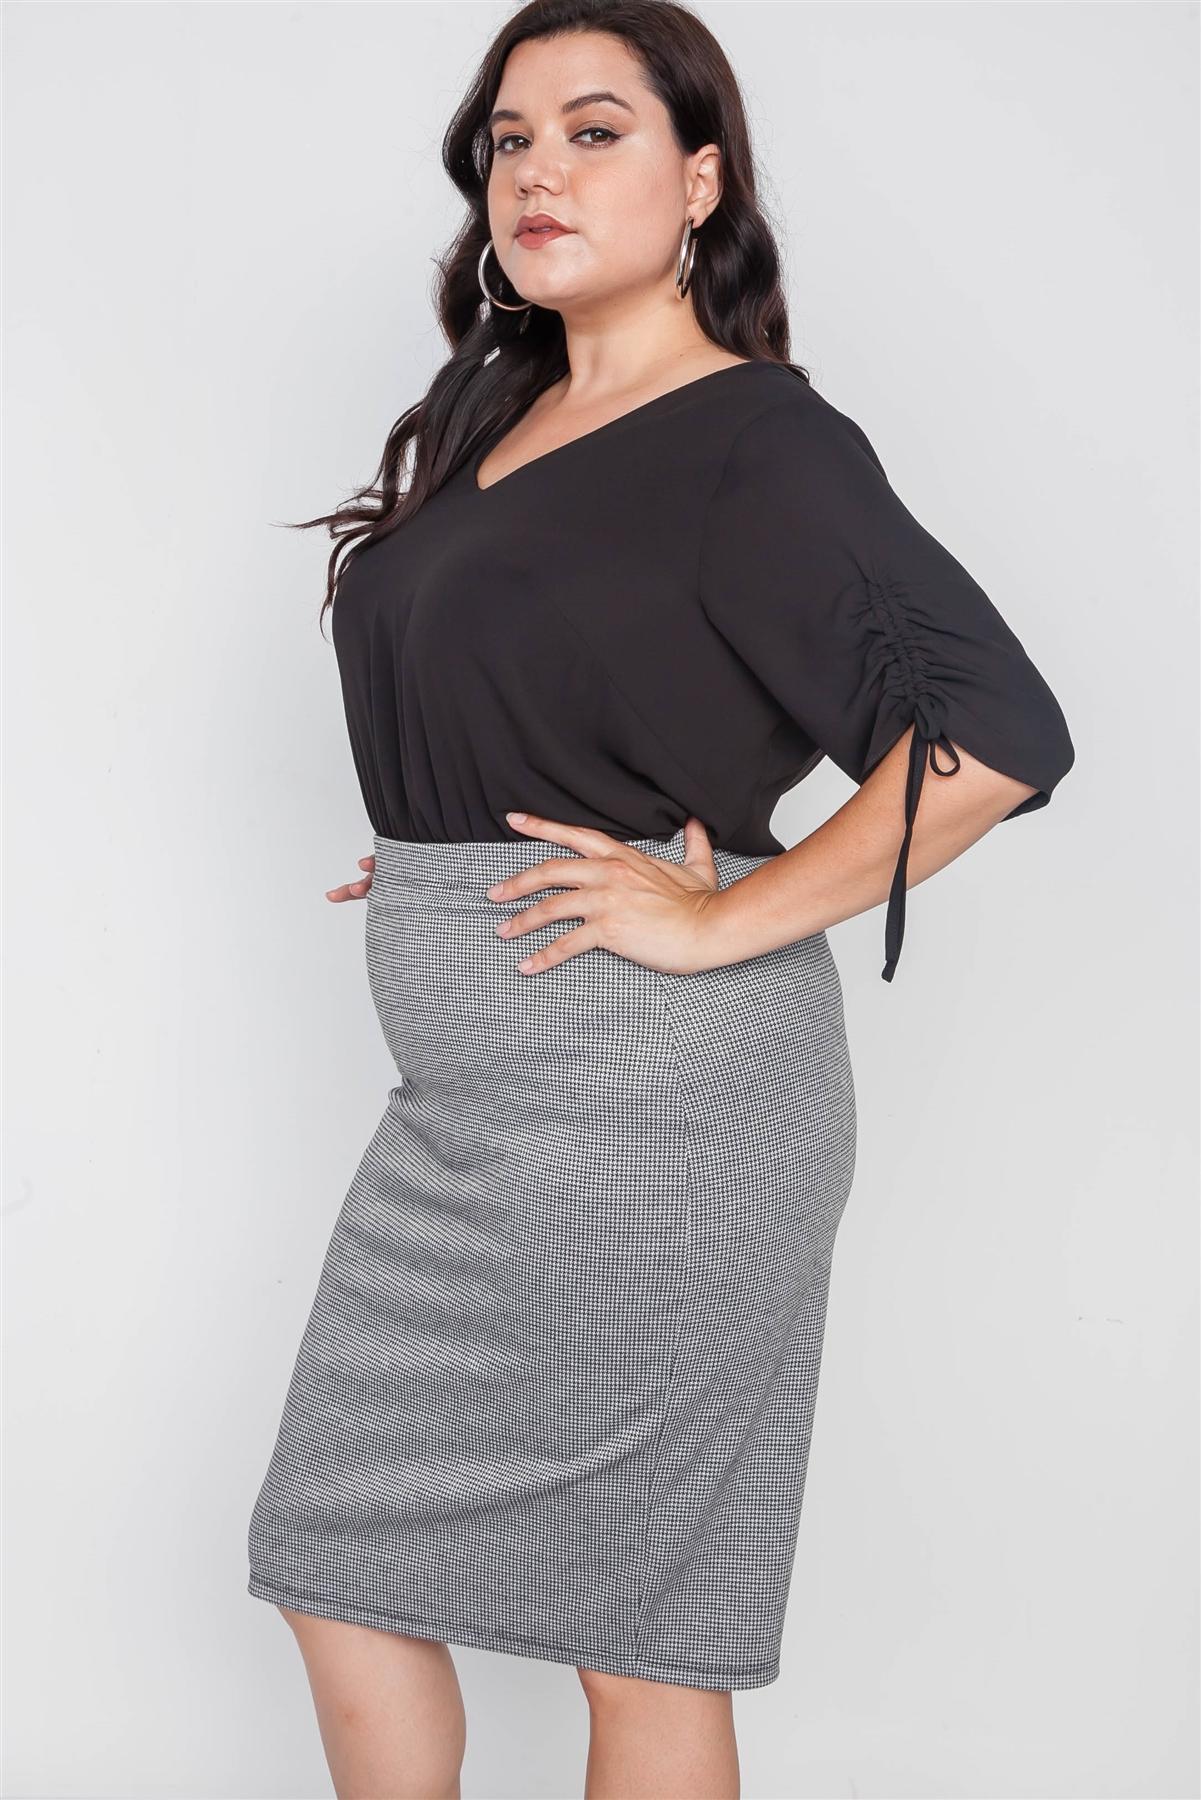 Plus Size Black White Plaid Pencil Skirt /2-2-2